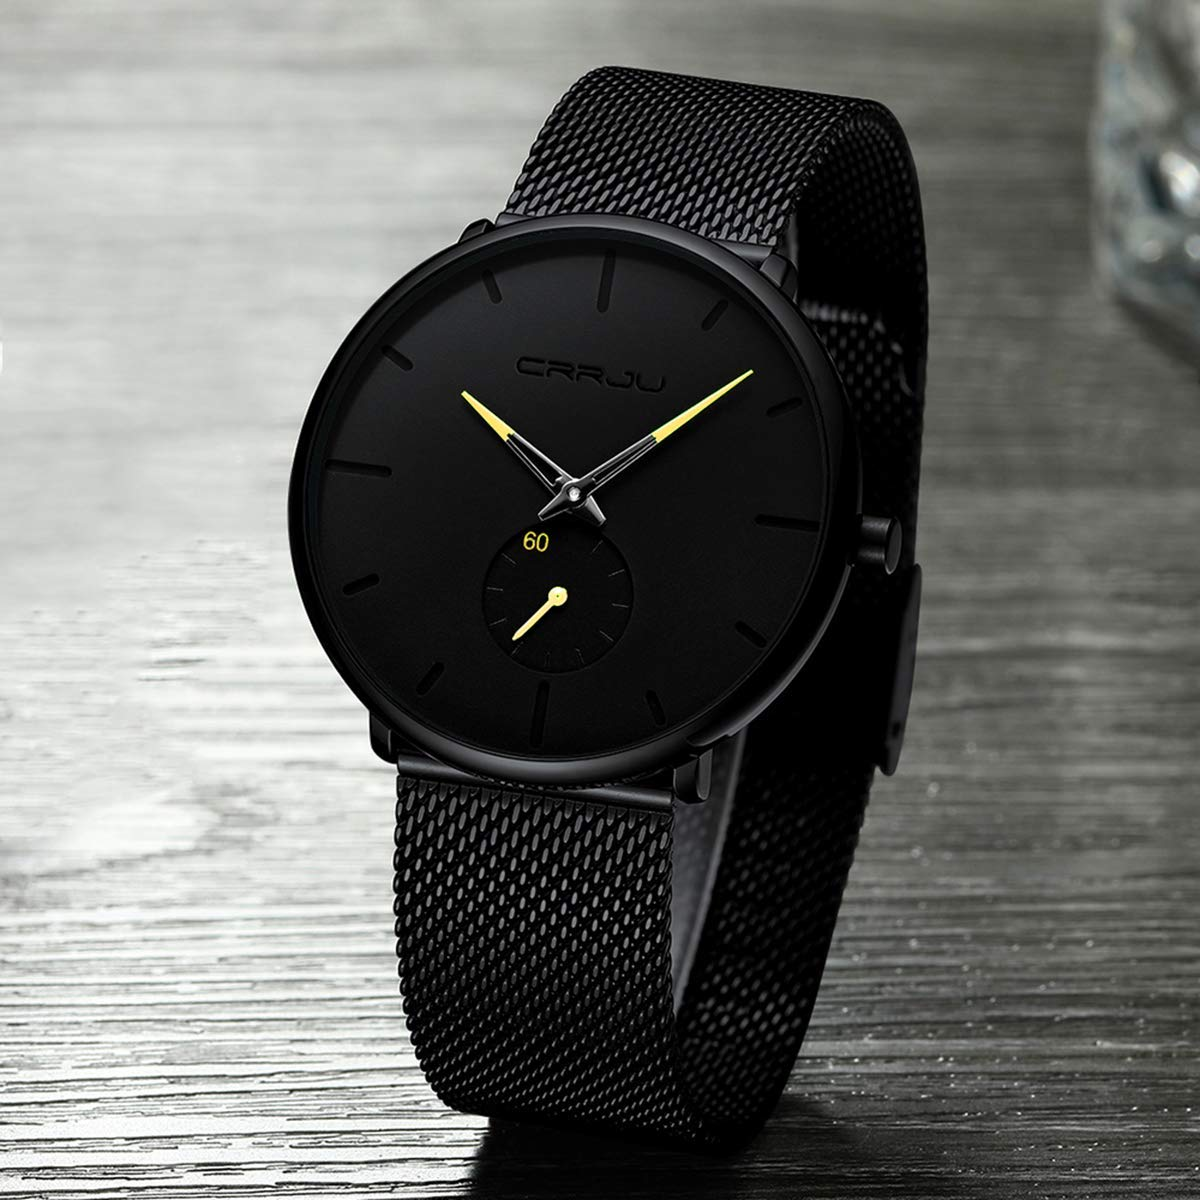 Hdd7aea1c92f5445f8d6a4d4b6c226aach CRRJU Ultra Thin Blue Stainless steel Quartz Watches Men Simple Fashion Business Japan Wristwatch Clock Male Relogio Masculino